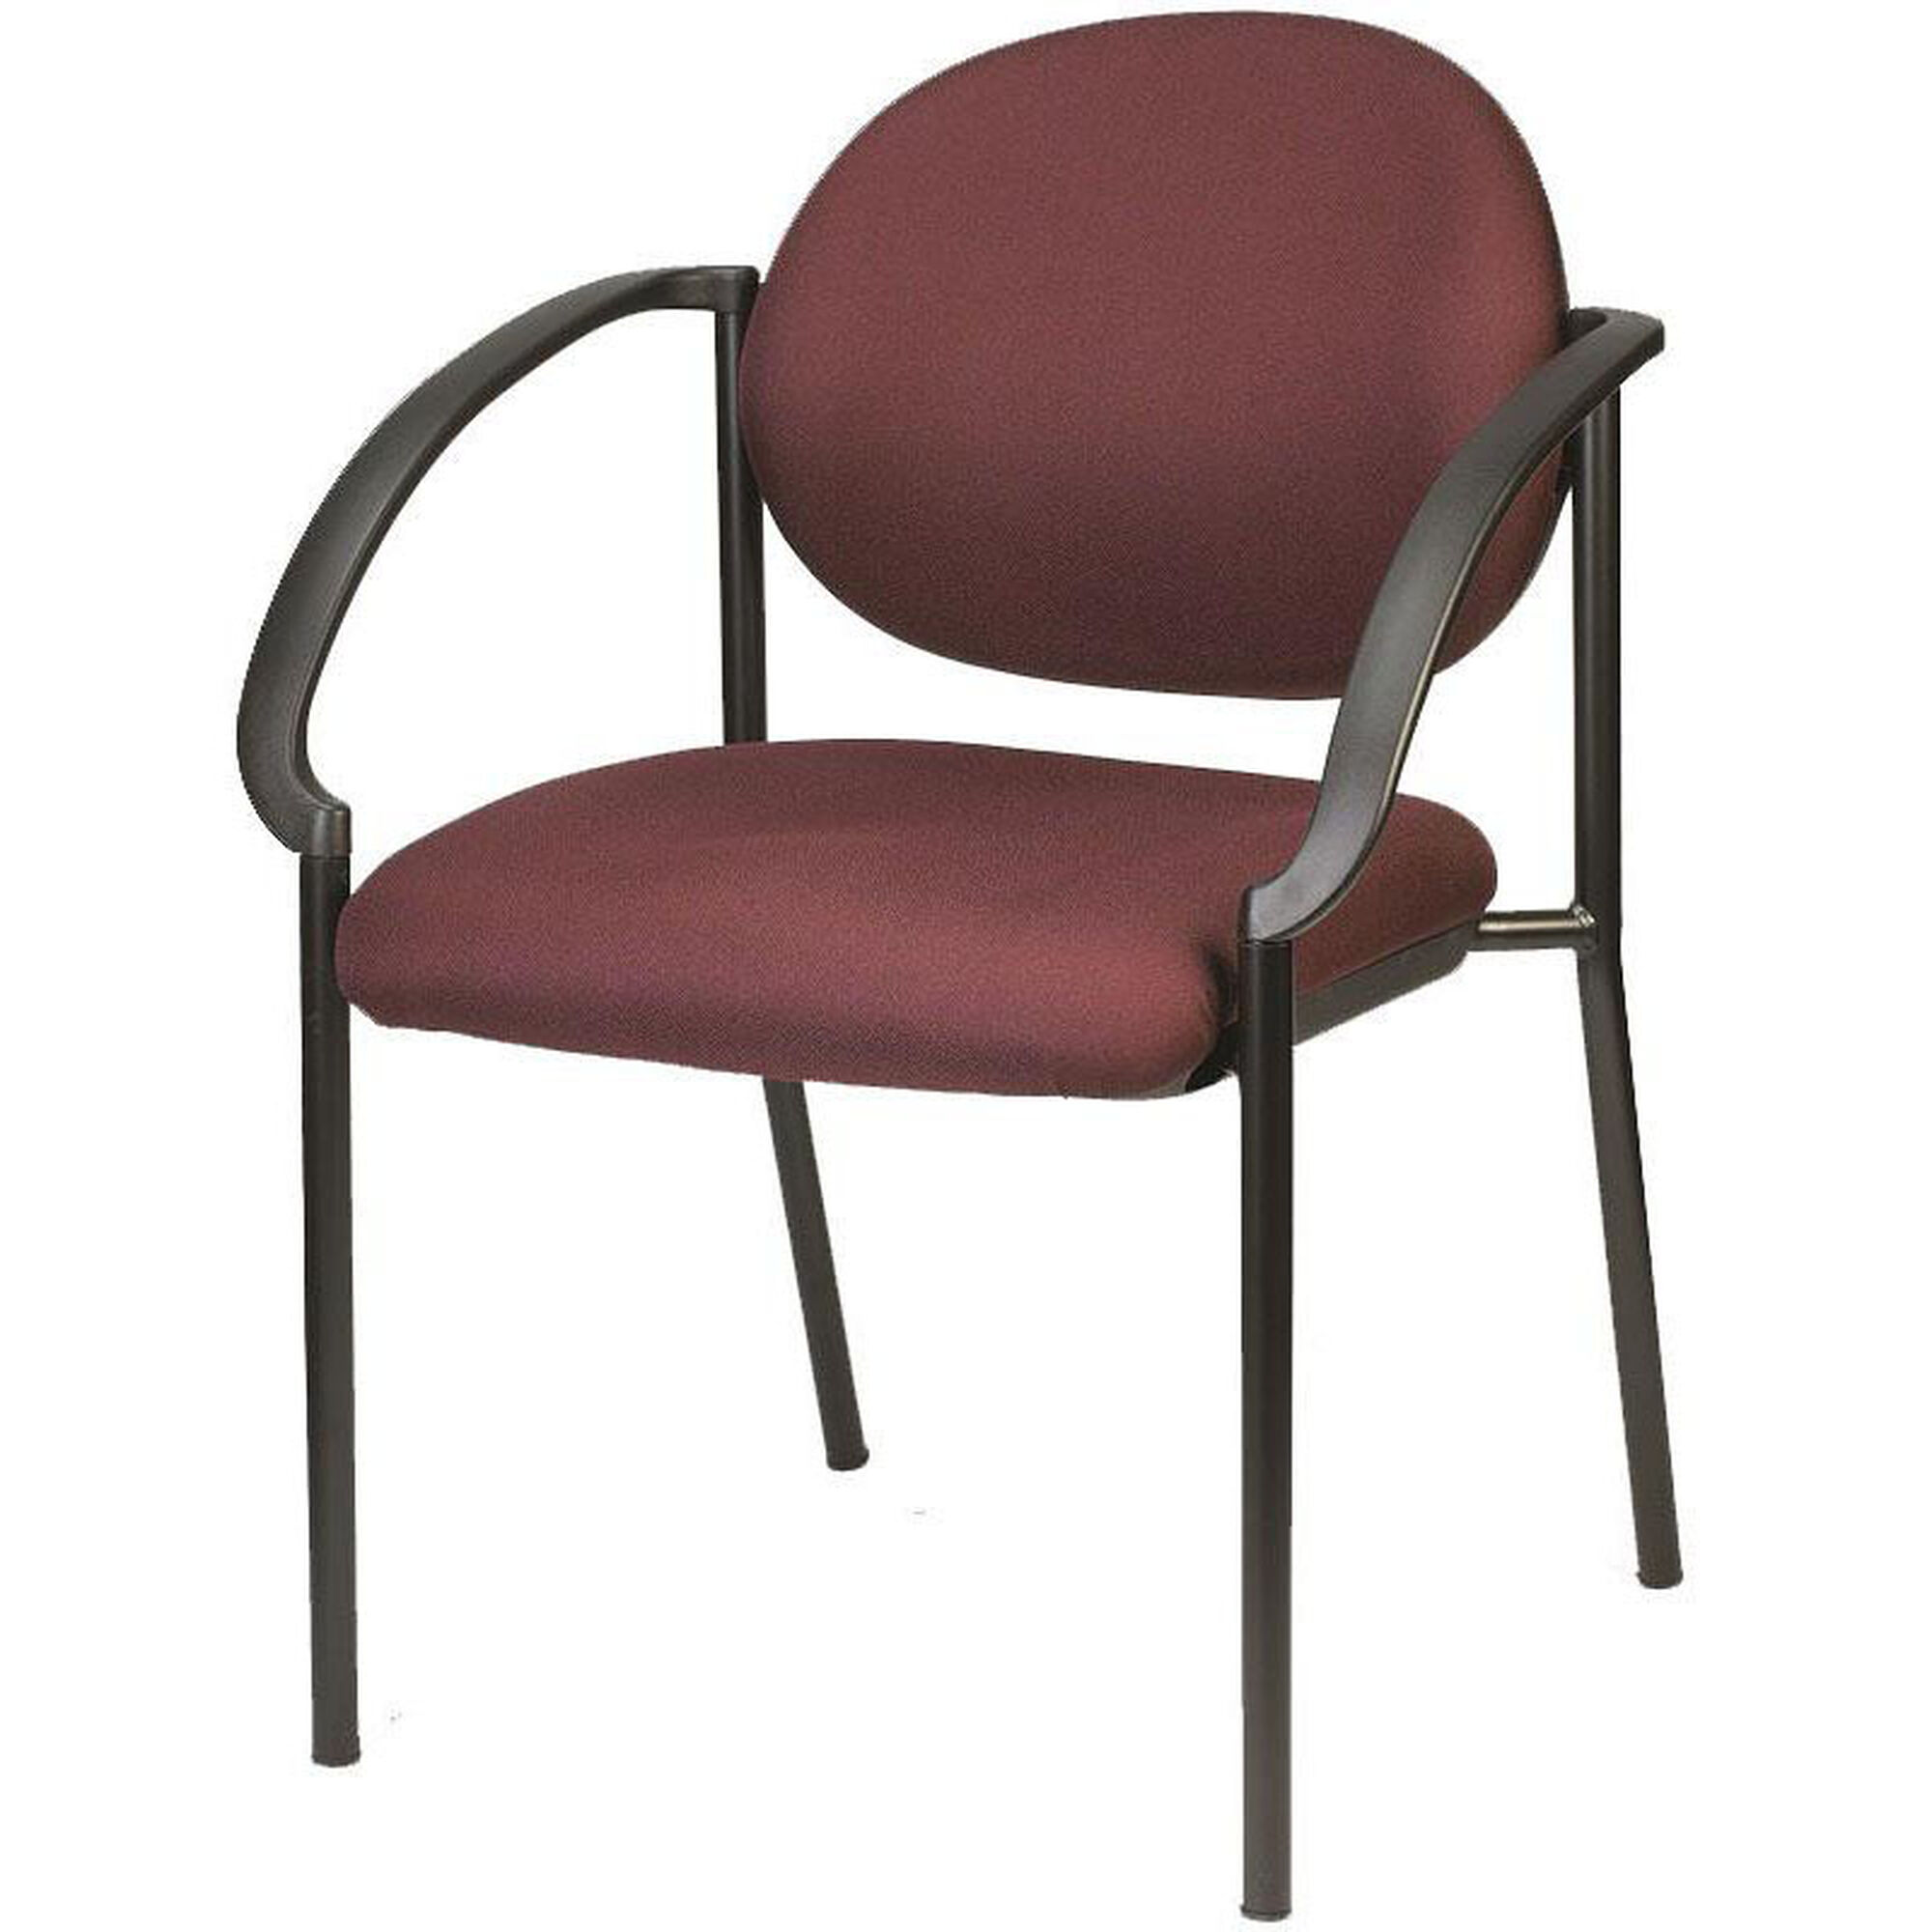 curved arm stack chair burgundy 9011 at31. Black Bedroom Furniture Sets. Home Design Ideas